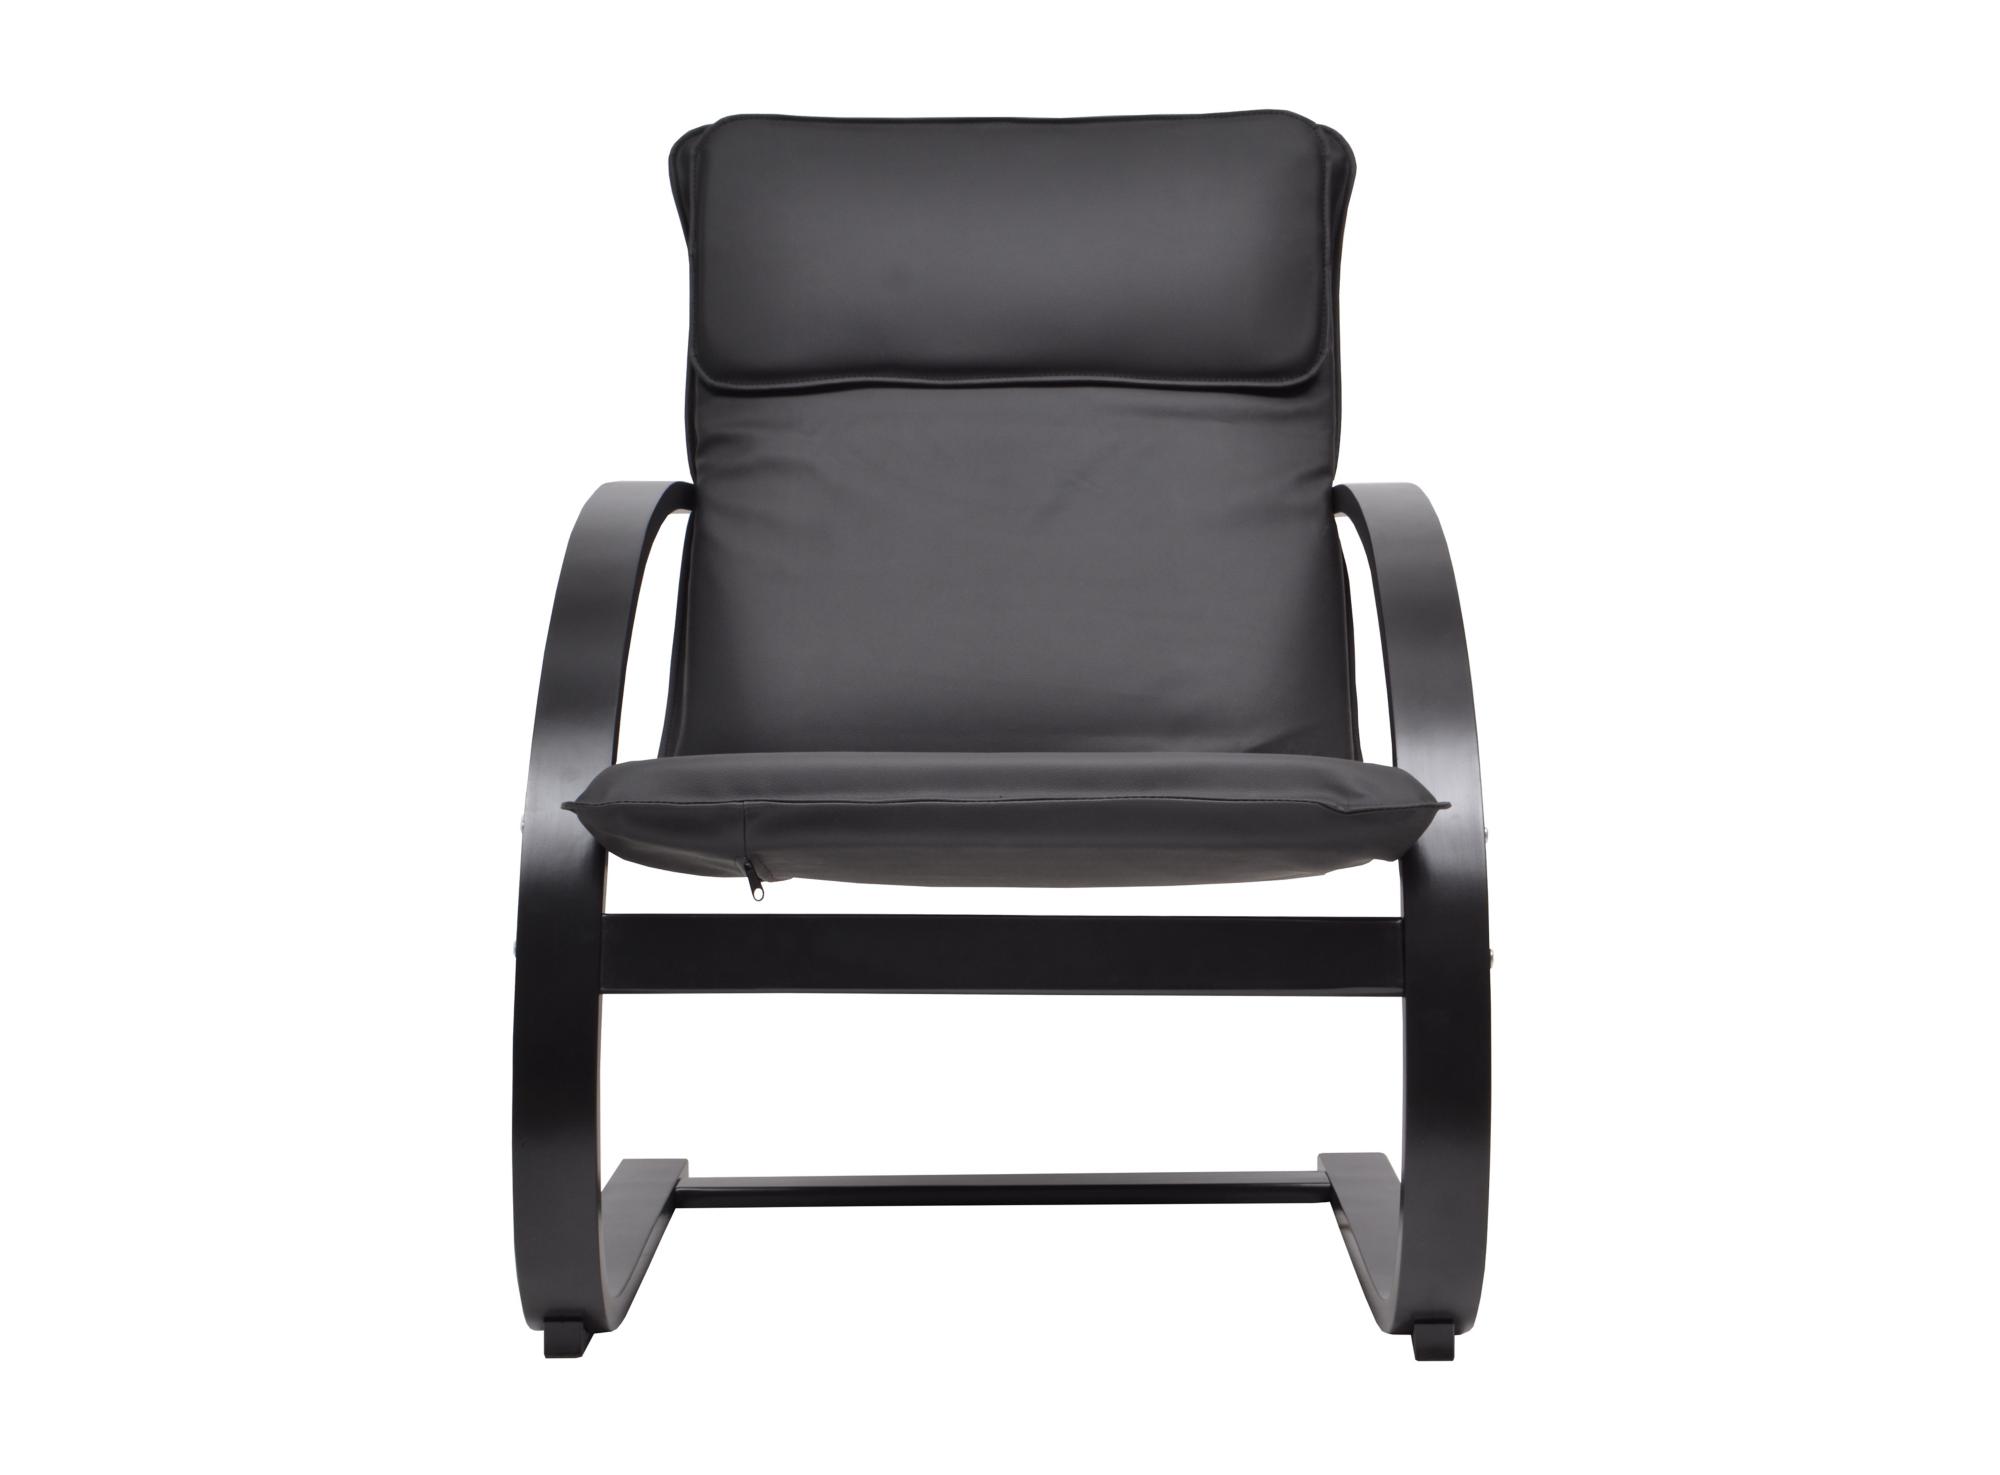 fauteuil tissu coloris noir fly. Black Bedroom Furniture Sets. Home Design Ideas